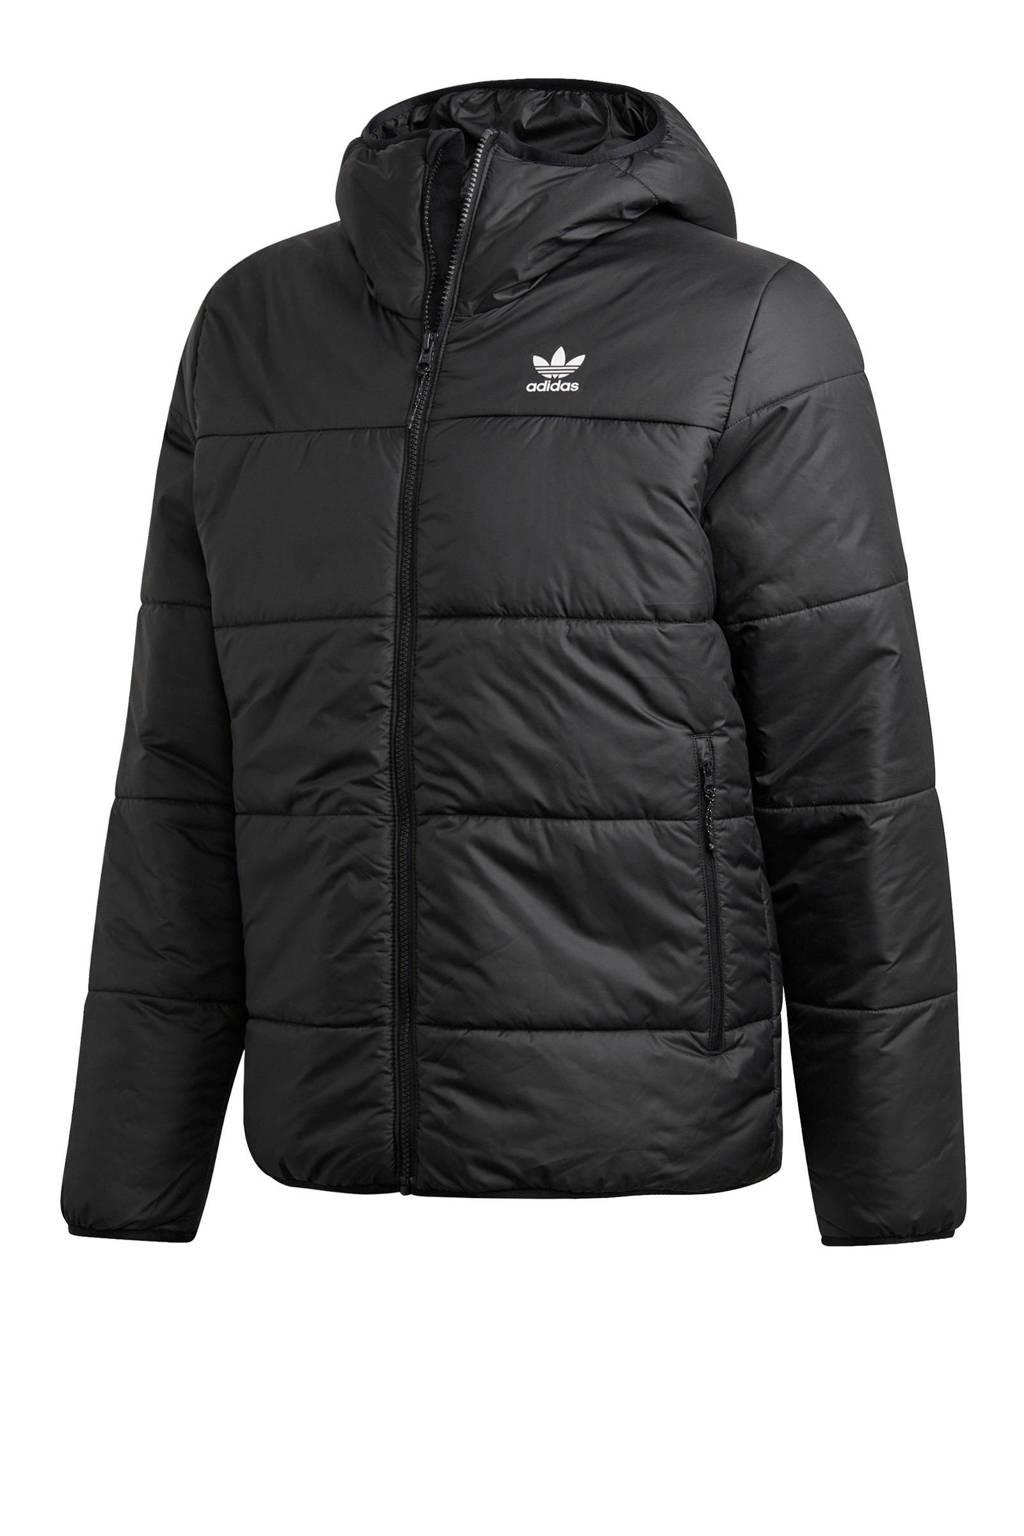 adidas Originals winterjas zwart, Zwart